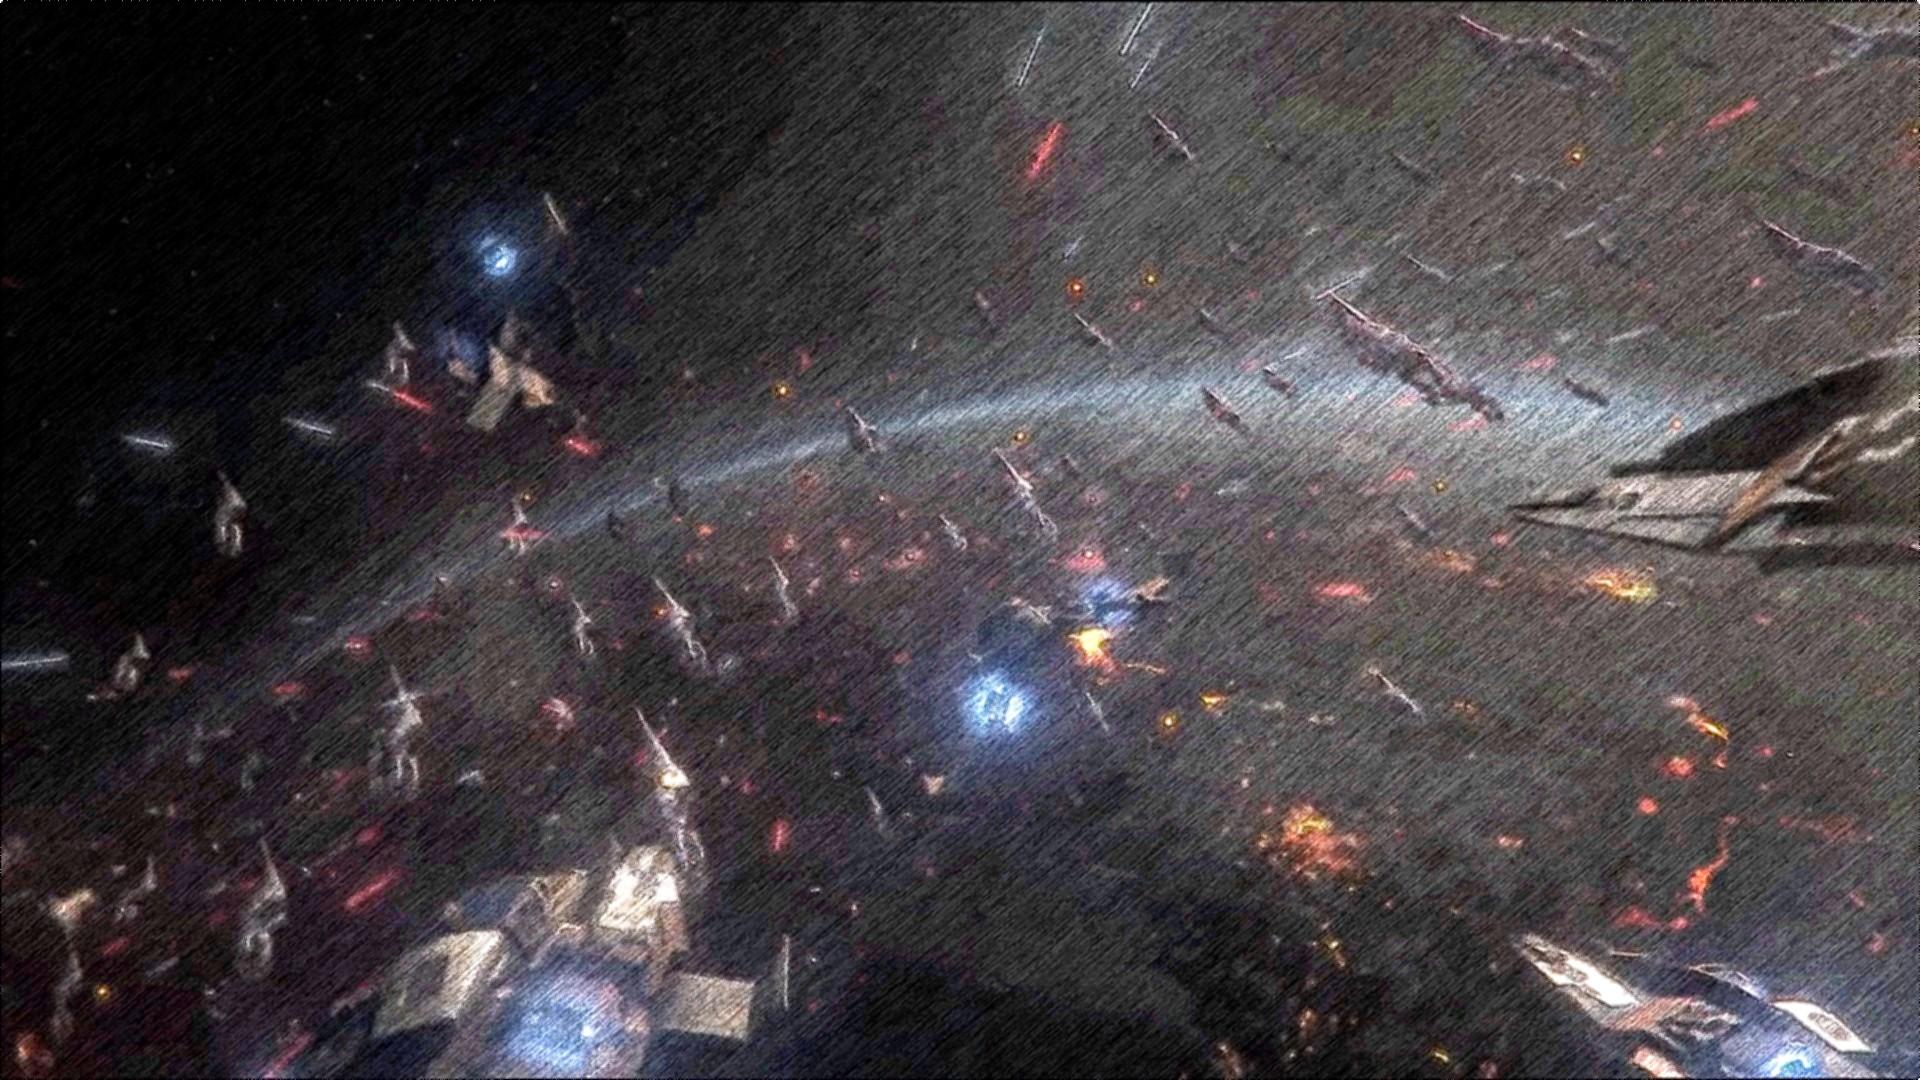 Star Wars Space Battle Wallpaper - WallpaperSafari